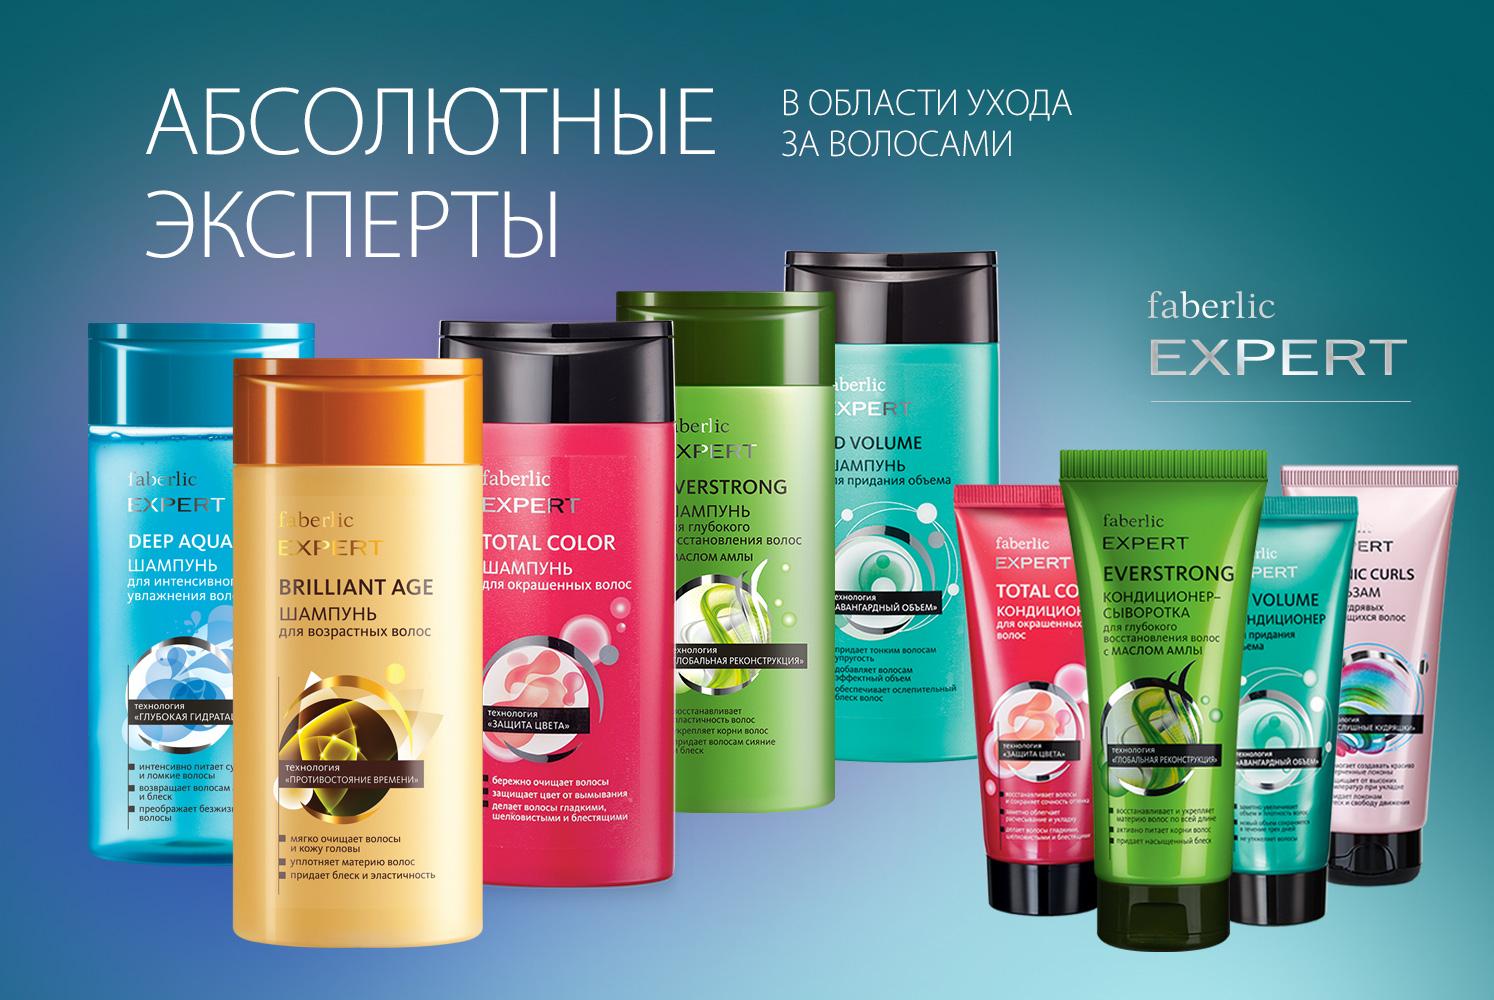 17-Expert-shampun-4-2016-promo